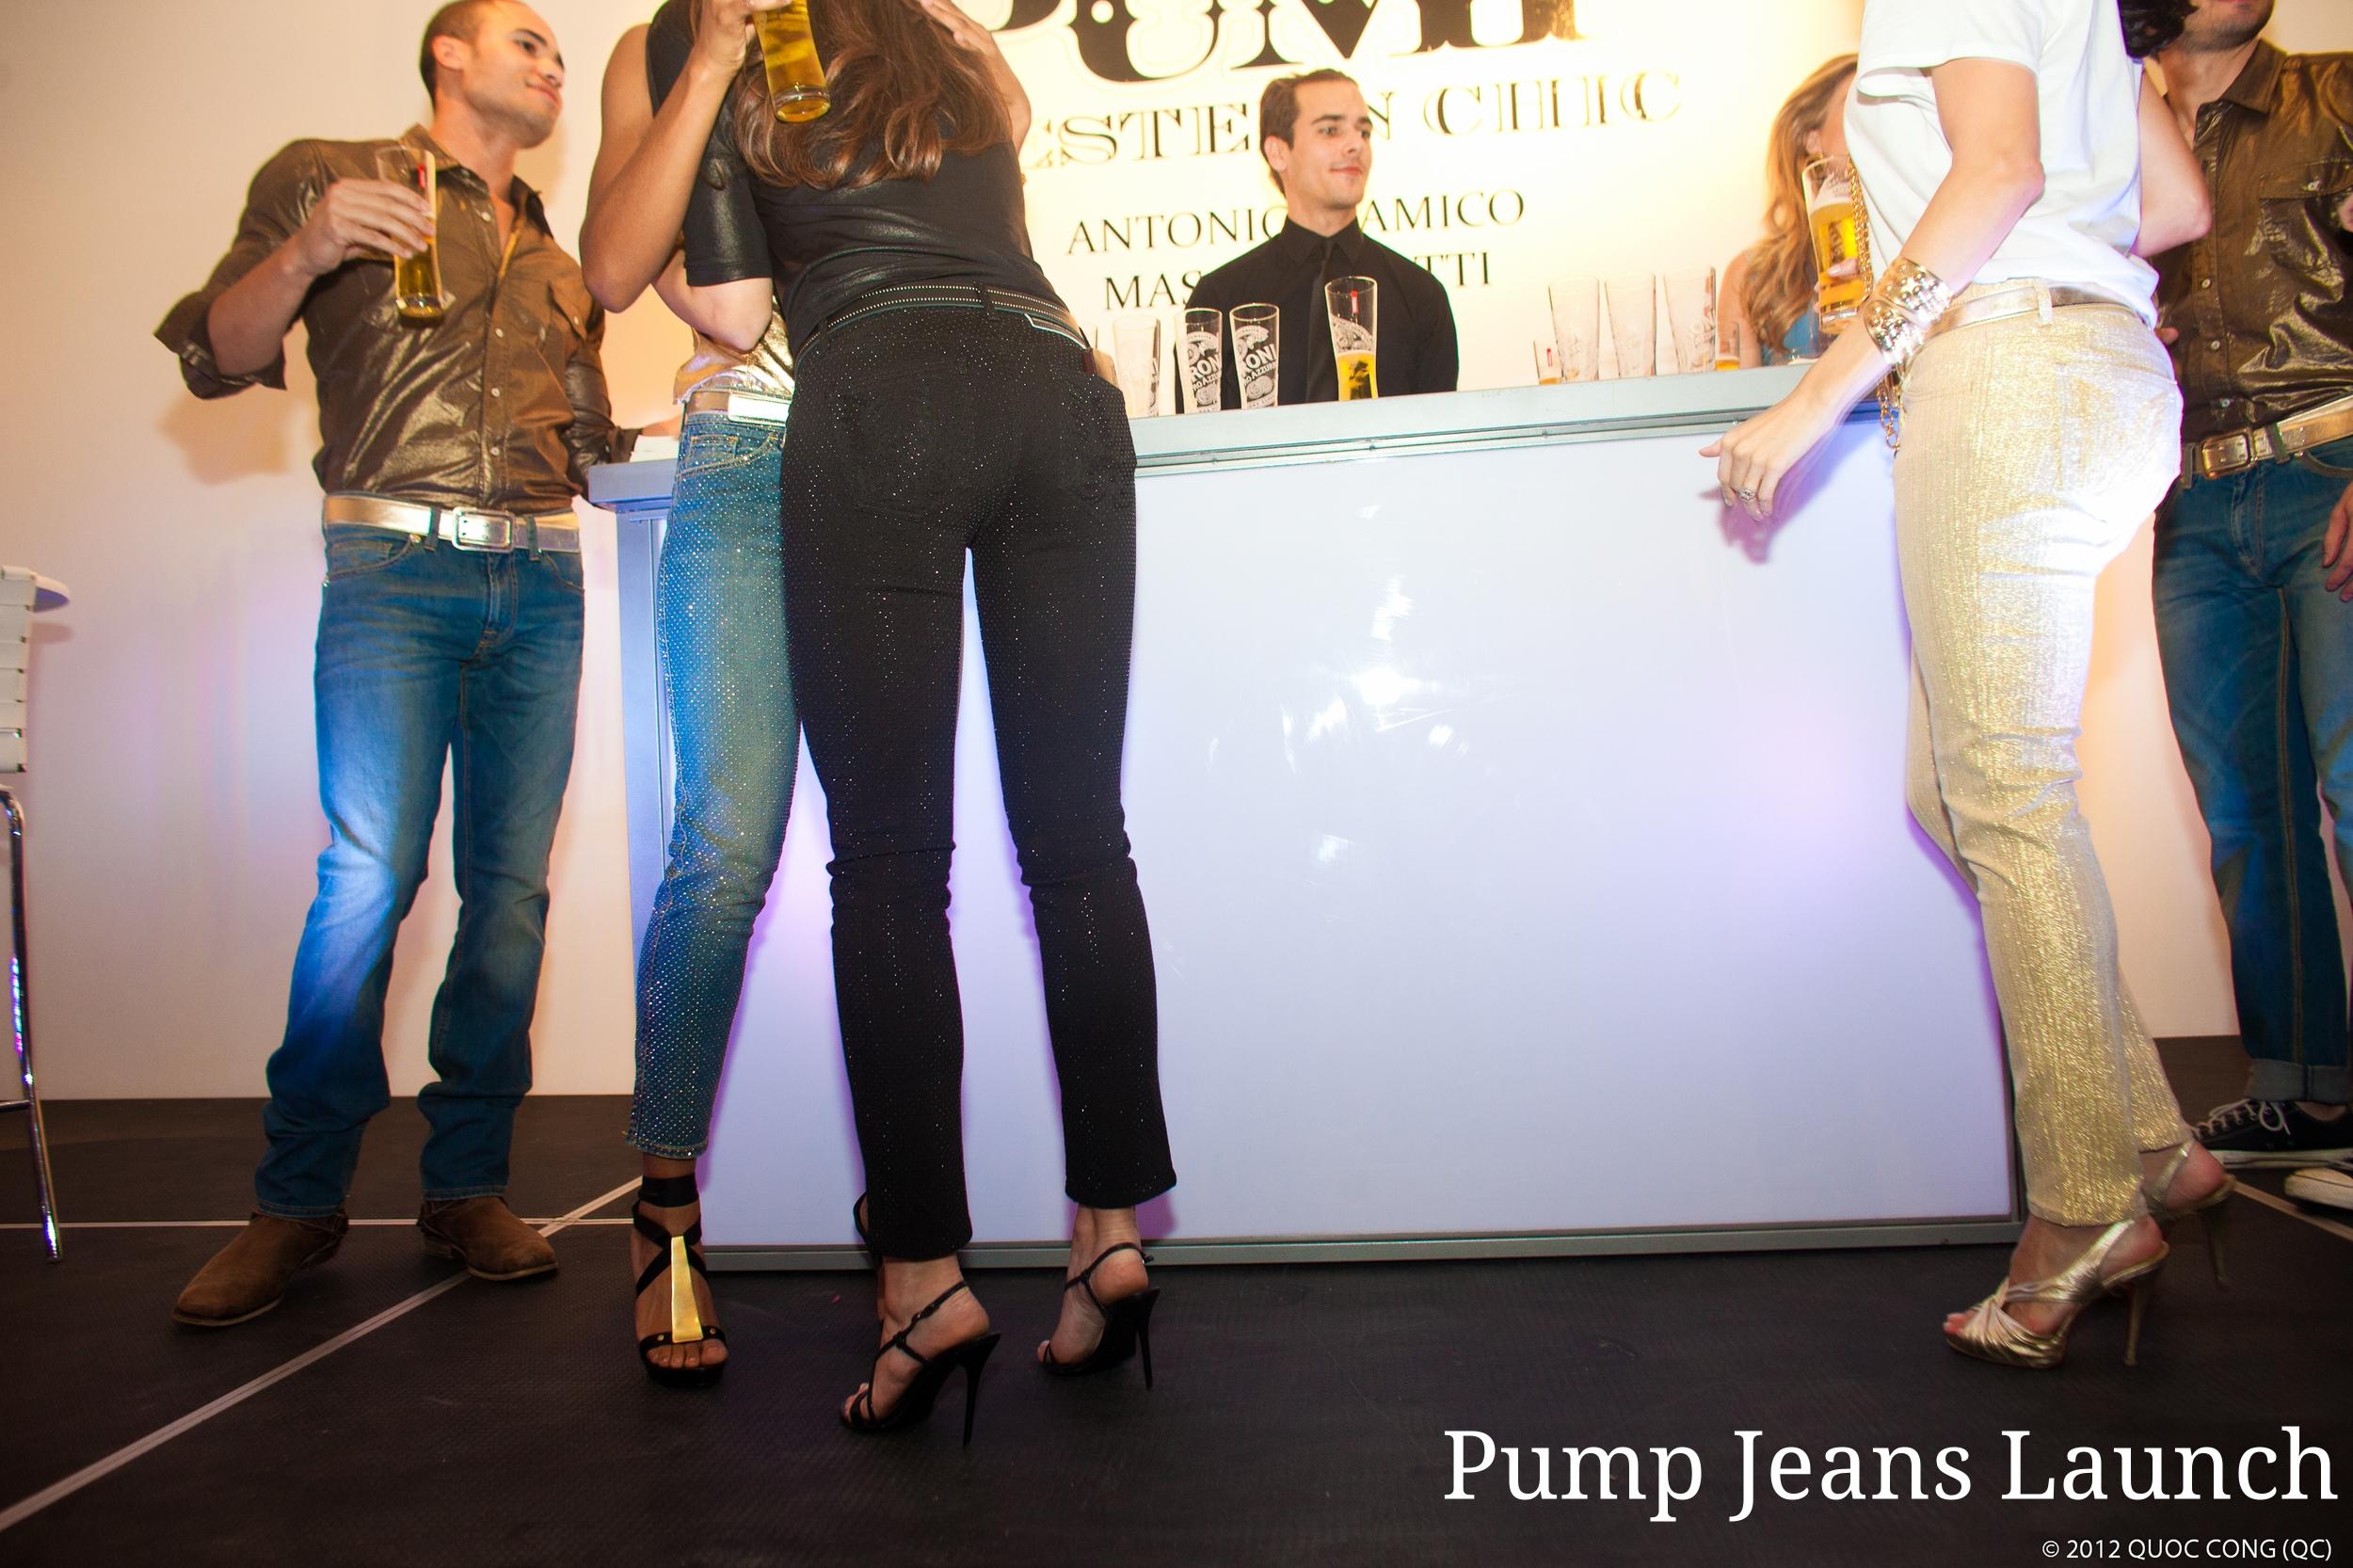 PumpJeansLaunch.JPG